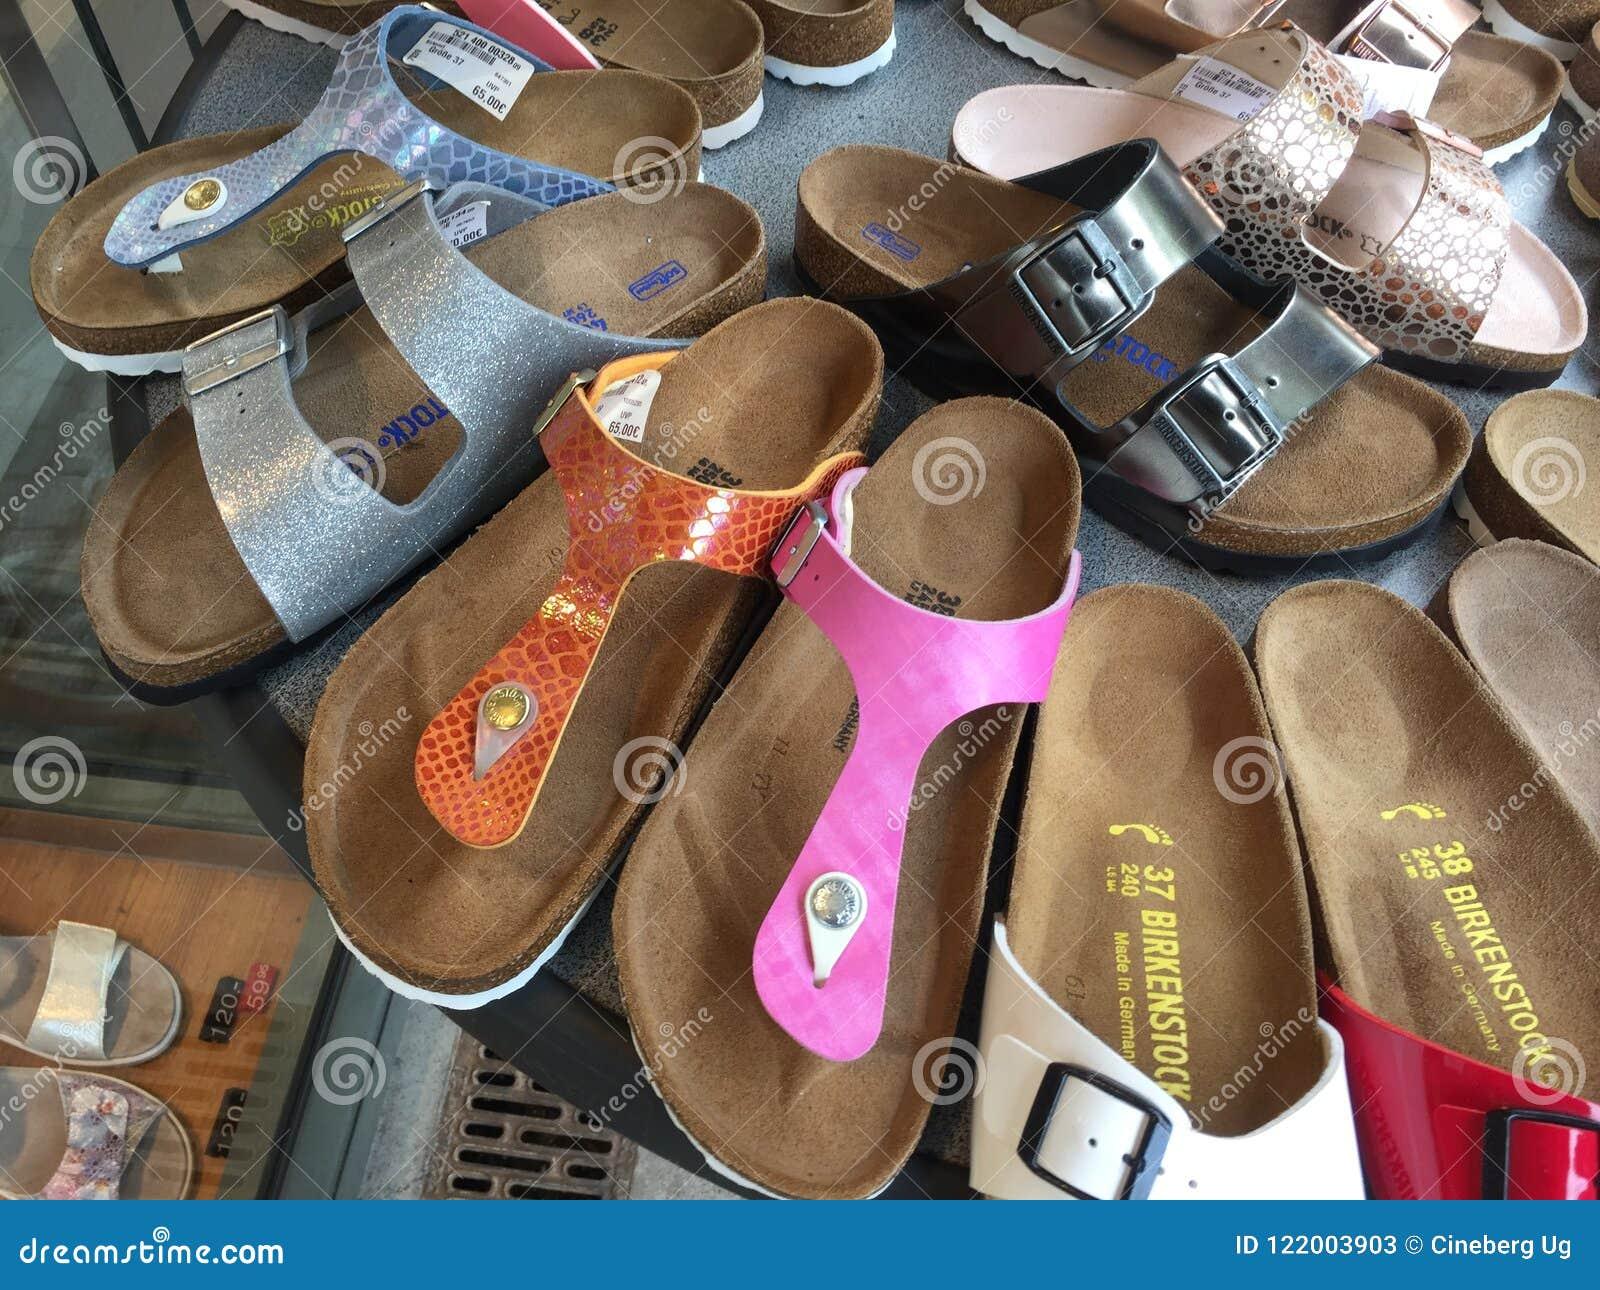 Birkenstock Sandals For Sale Editorial